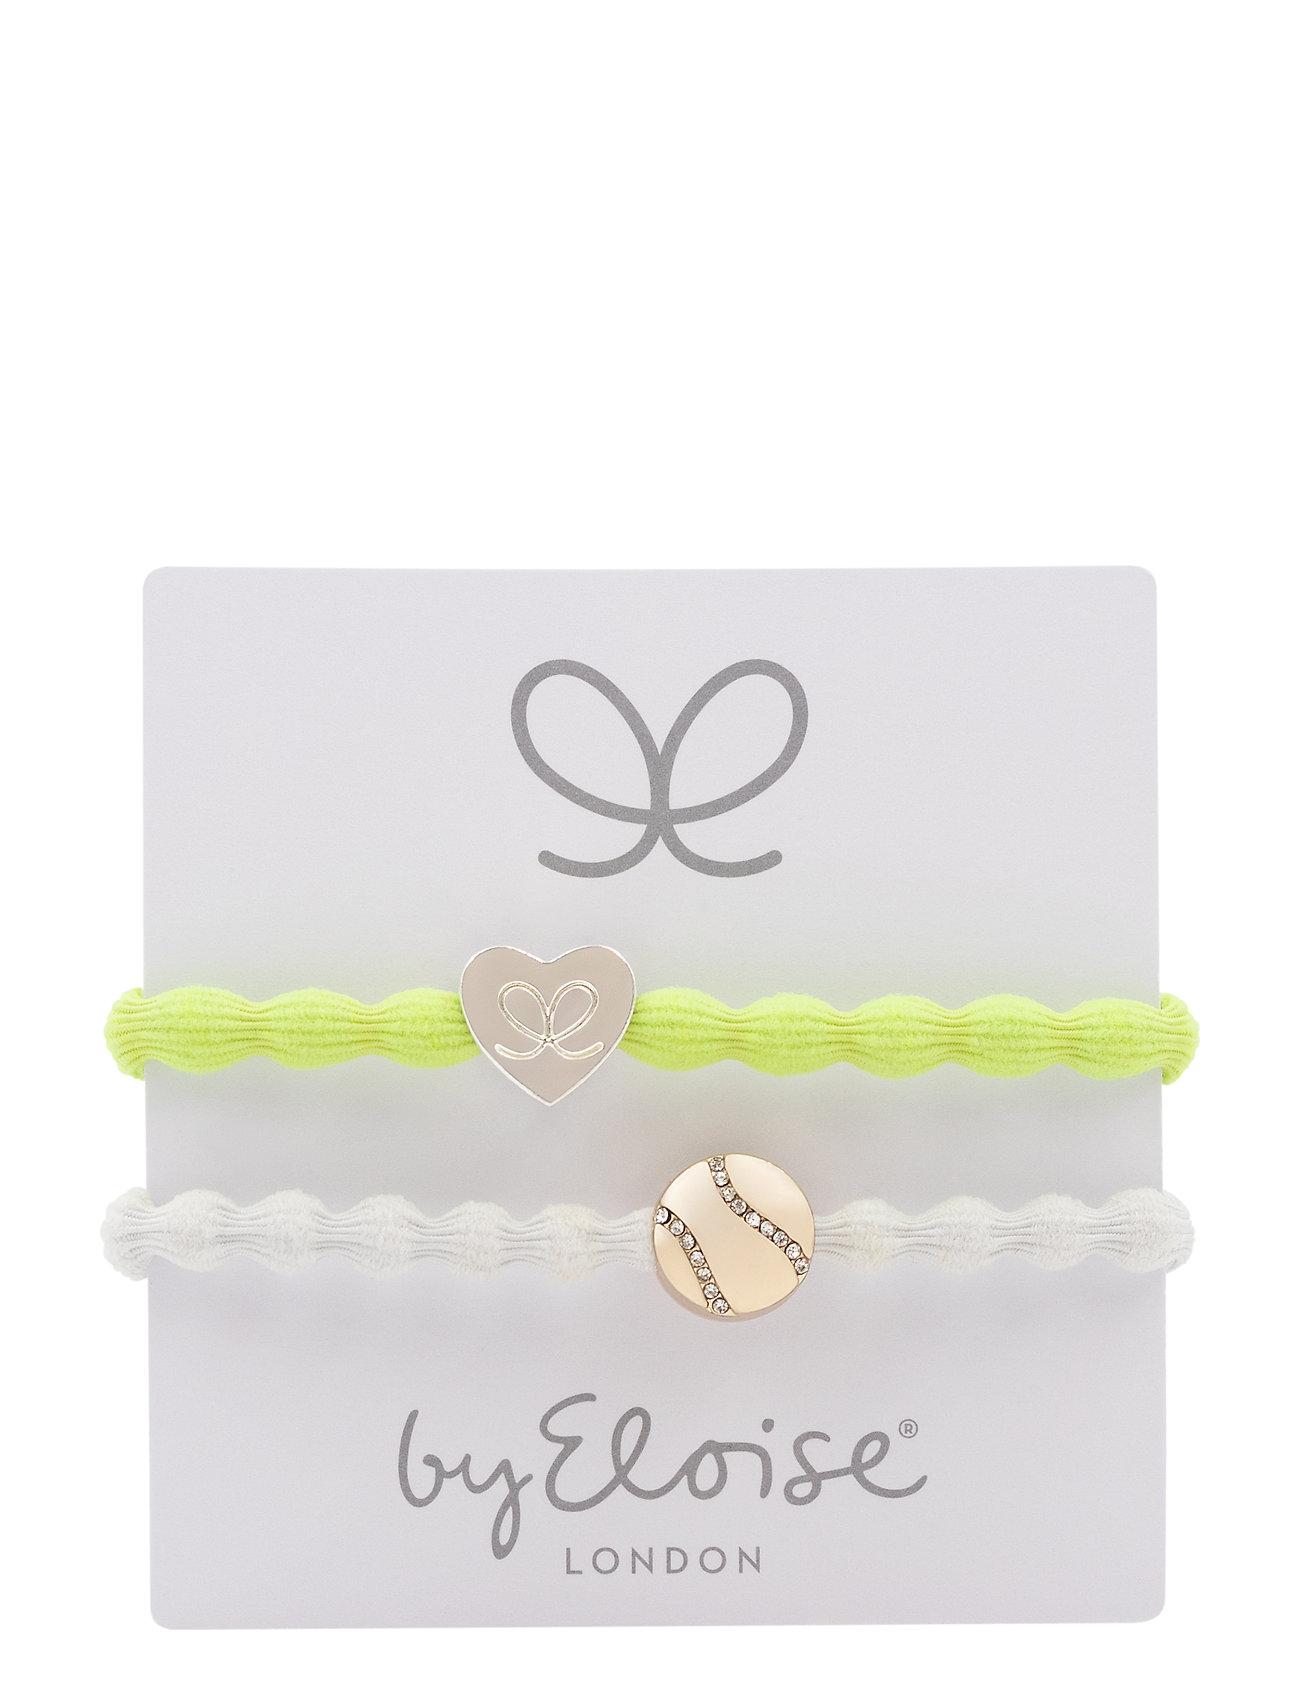 Silver Heart On Lemon Yellow And Bling Tennis Ball On White - ByEloise